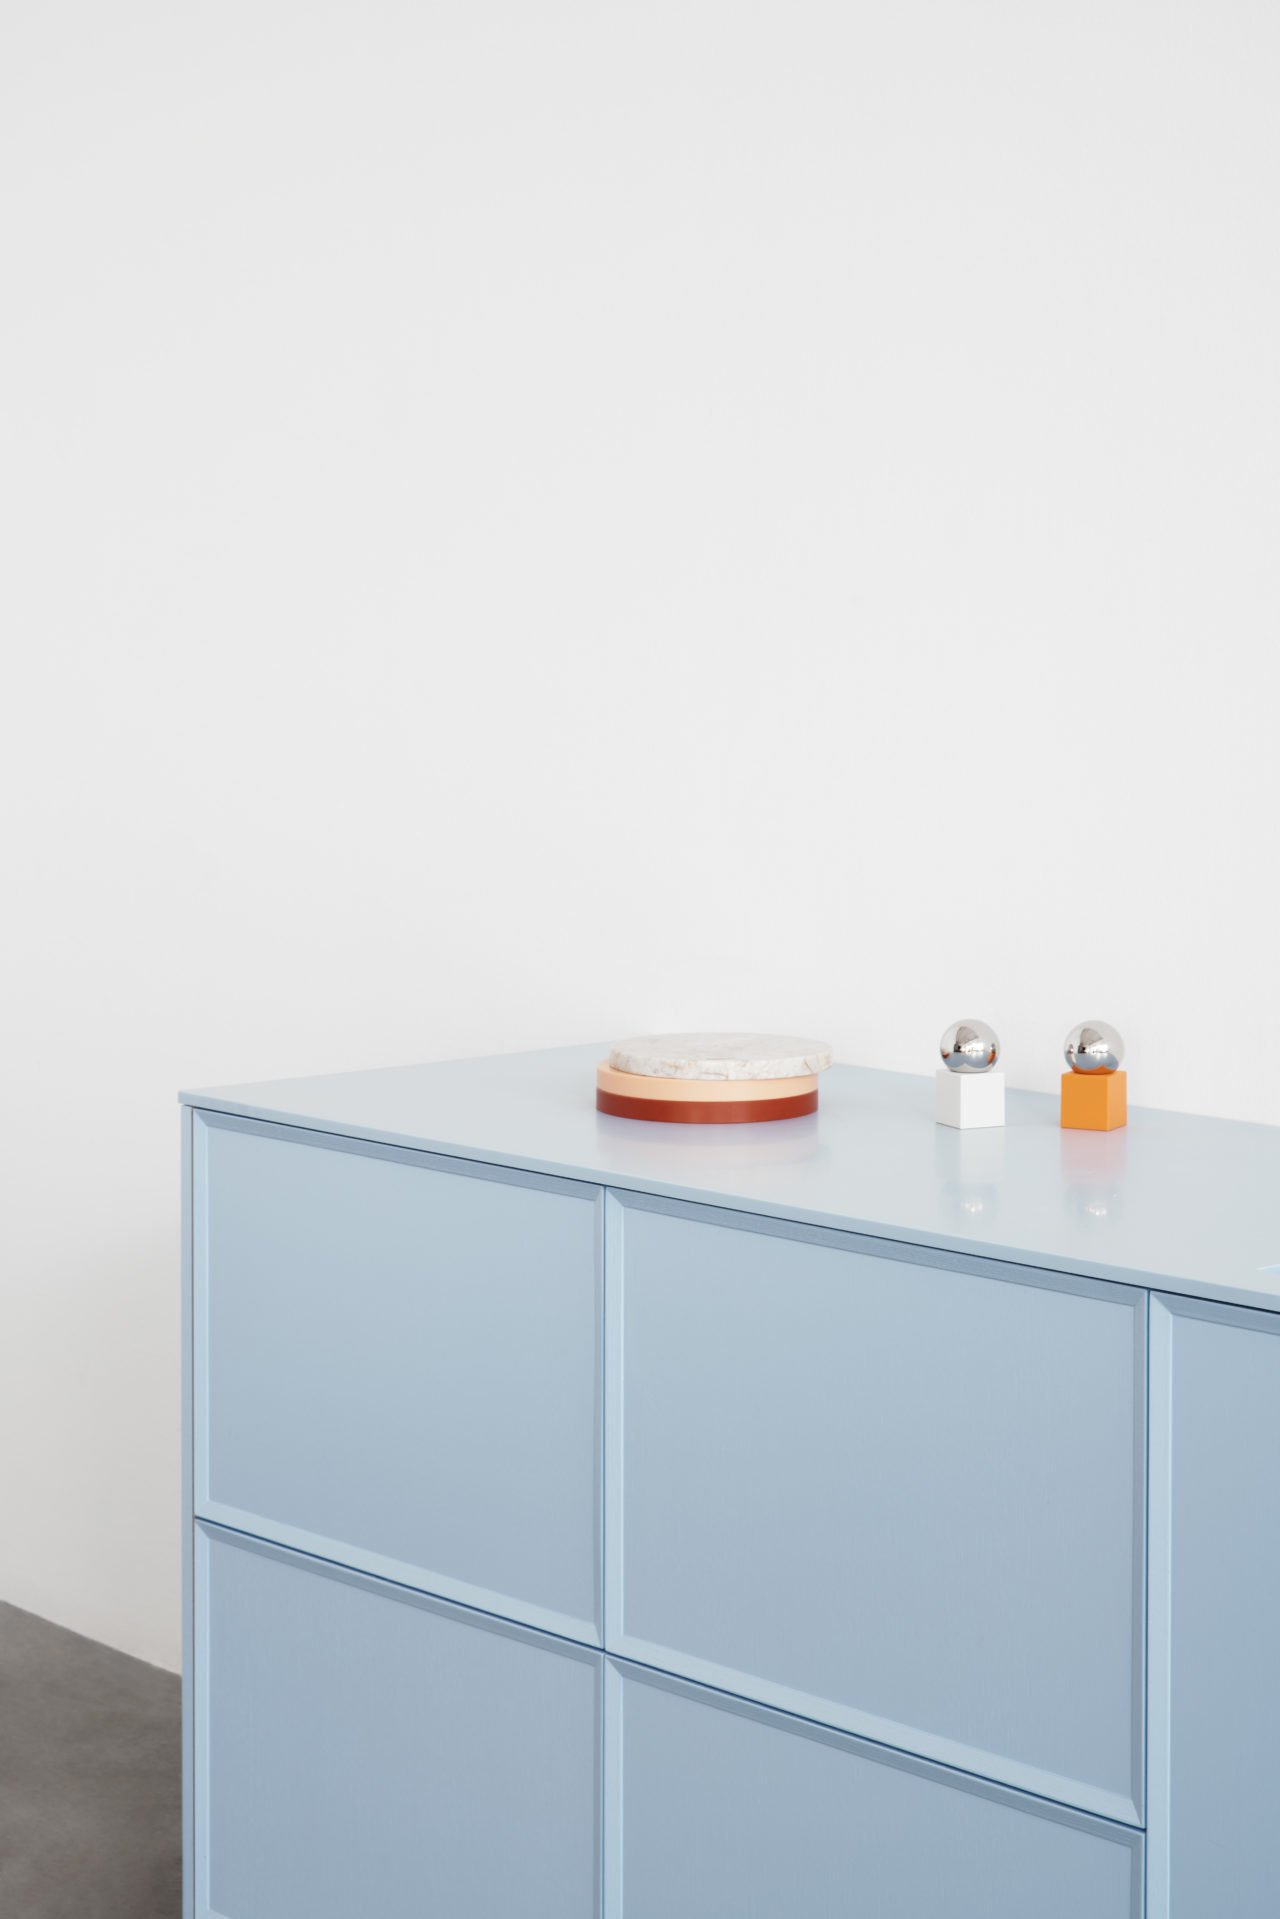 Reform light blue kitchen cabinets by Note Design Studio.